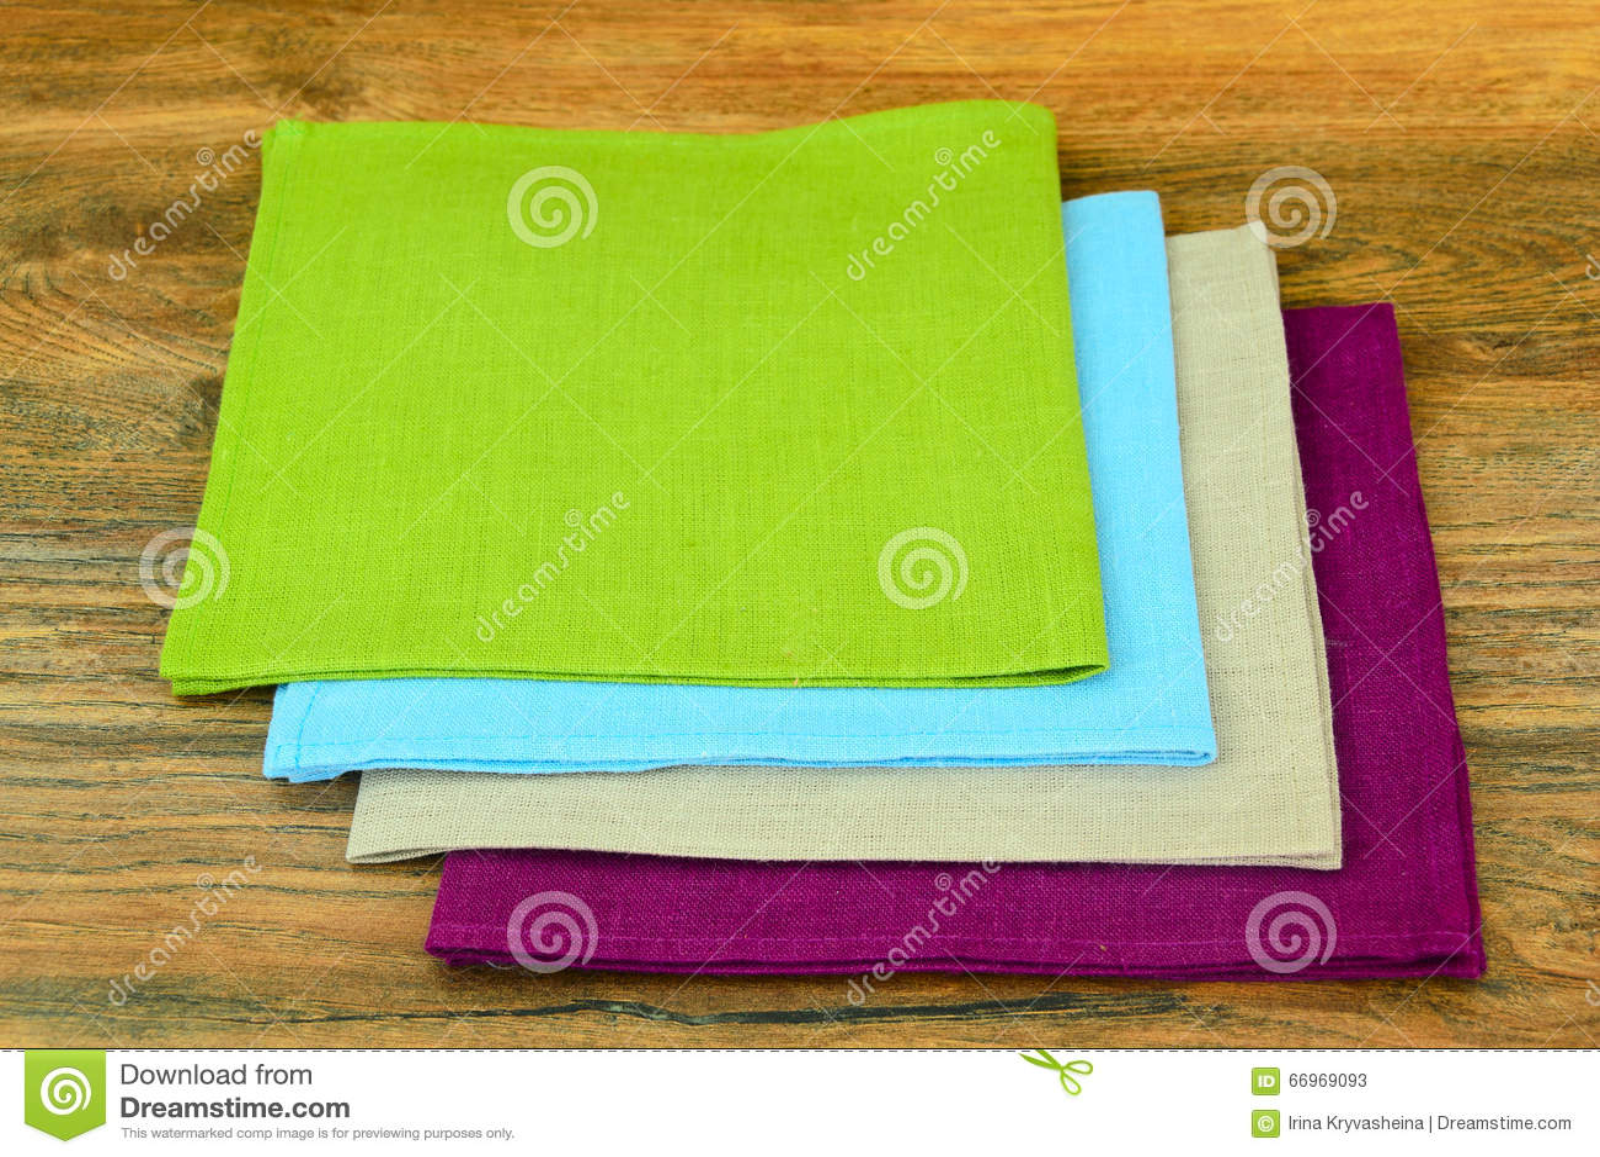 kitchen napkins thai noodles 服务在木背景的厨房餐巾库存图片 图片包括有正餐 问候 部门 厨具 蓝 服务在木背景演播室照片的厨房餐巾